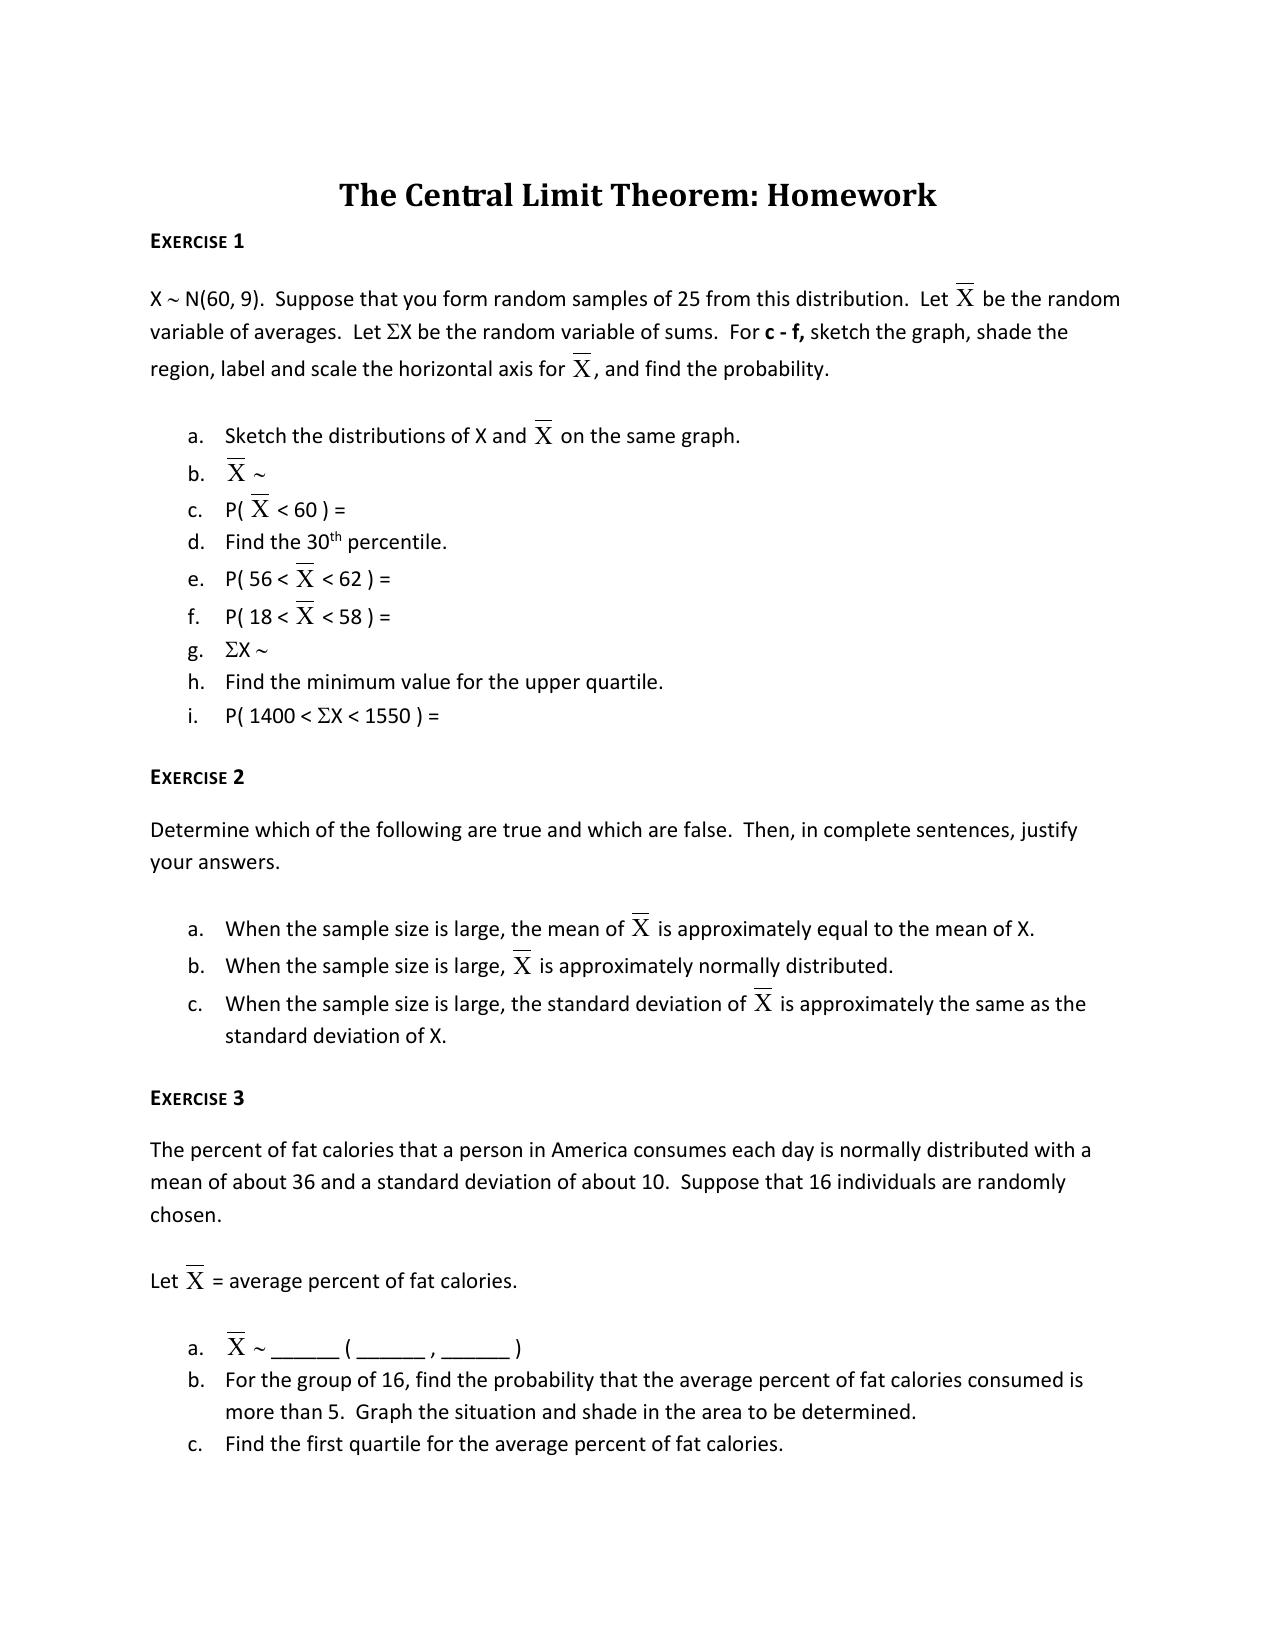 The Central Limit Theorem Homework